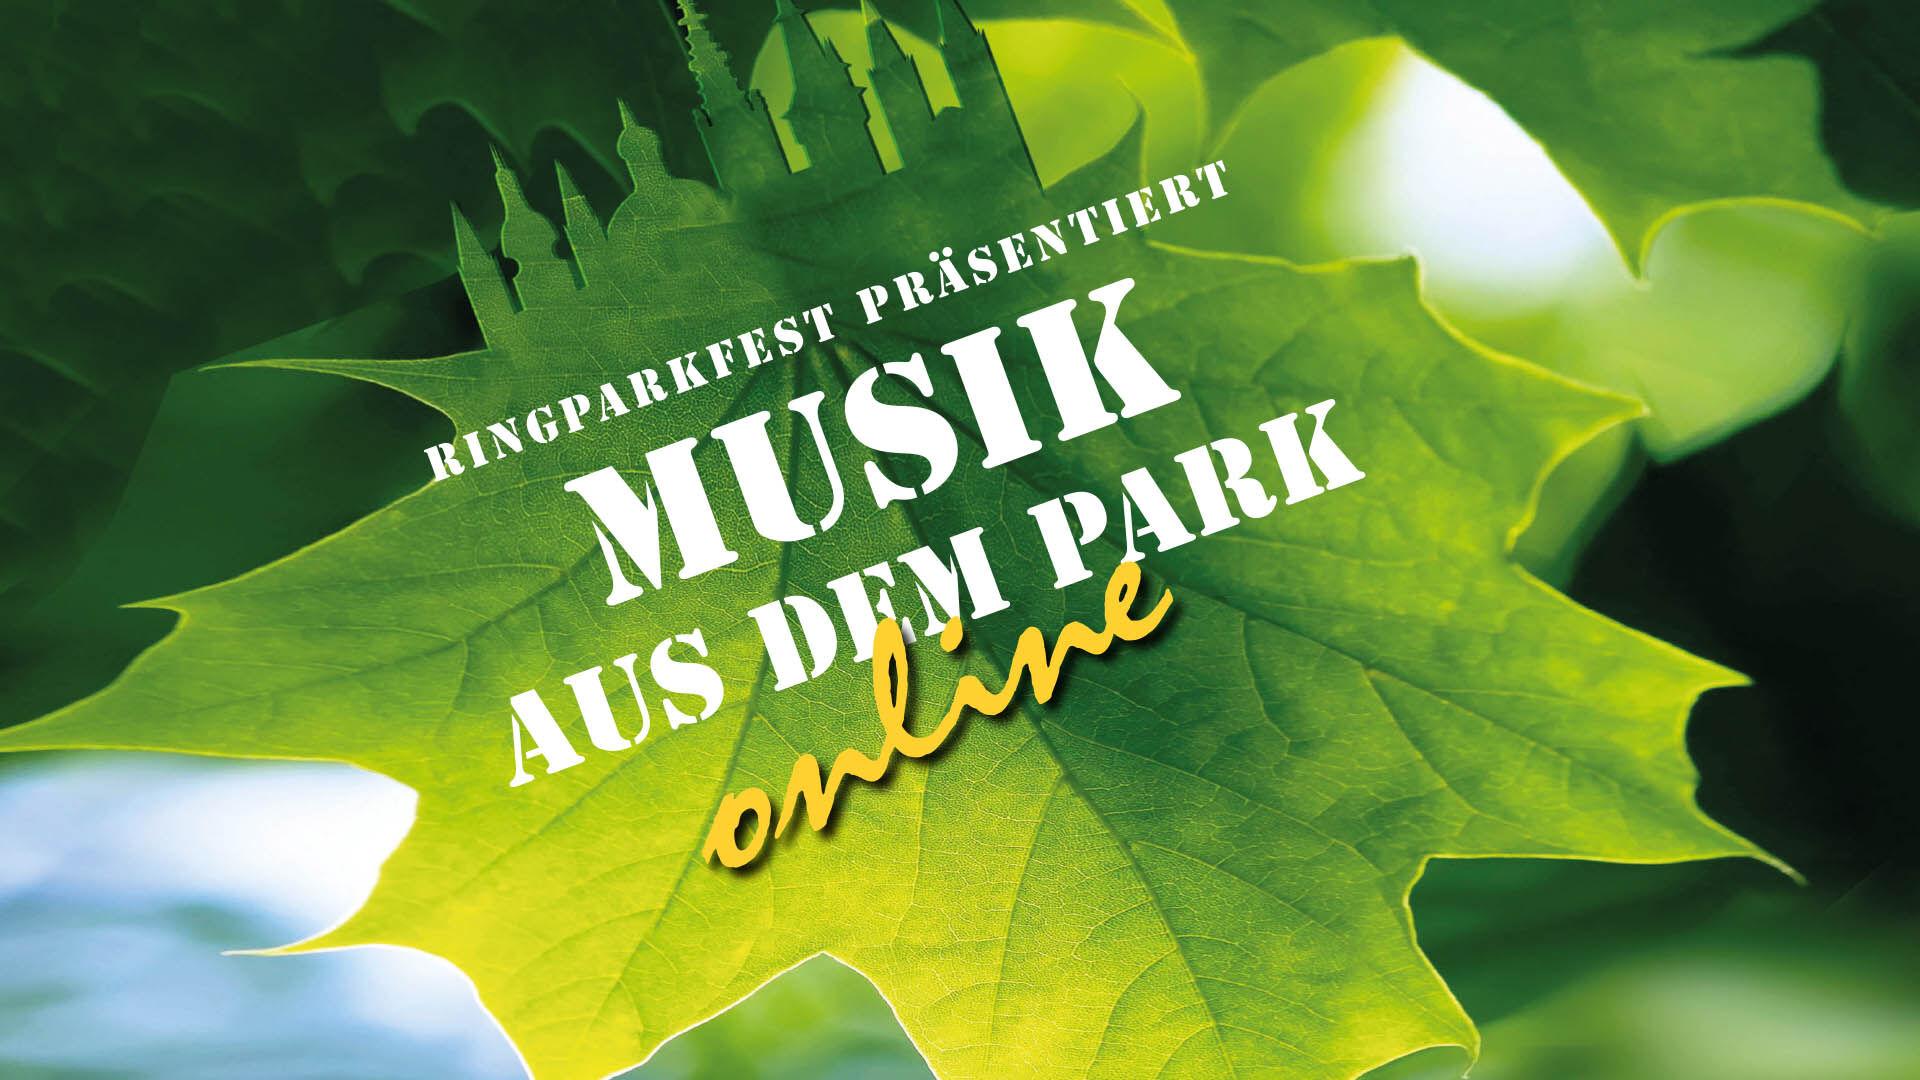 Musik aus dem Park quer ohne